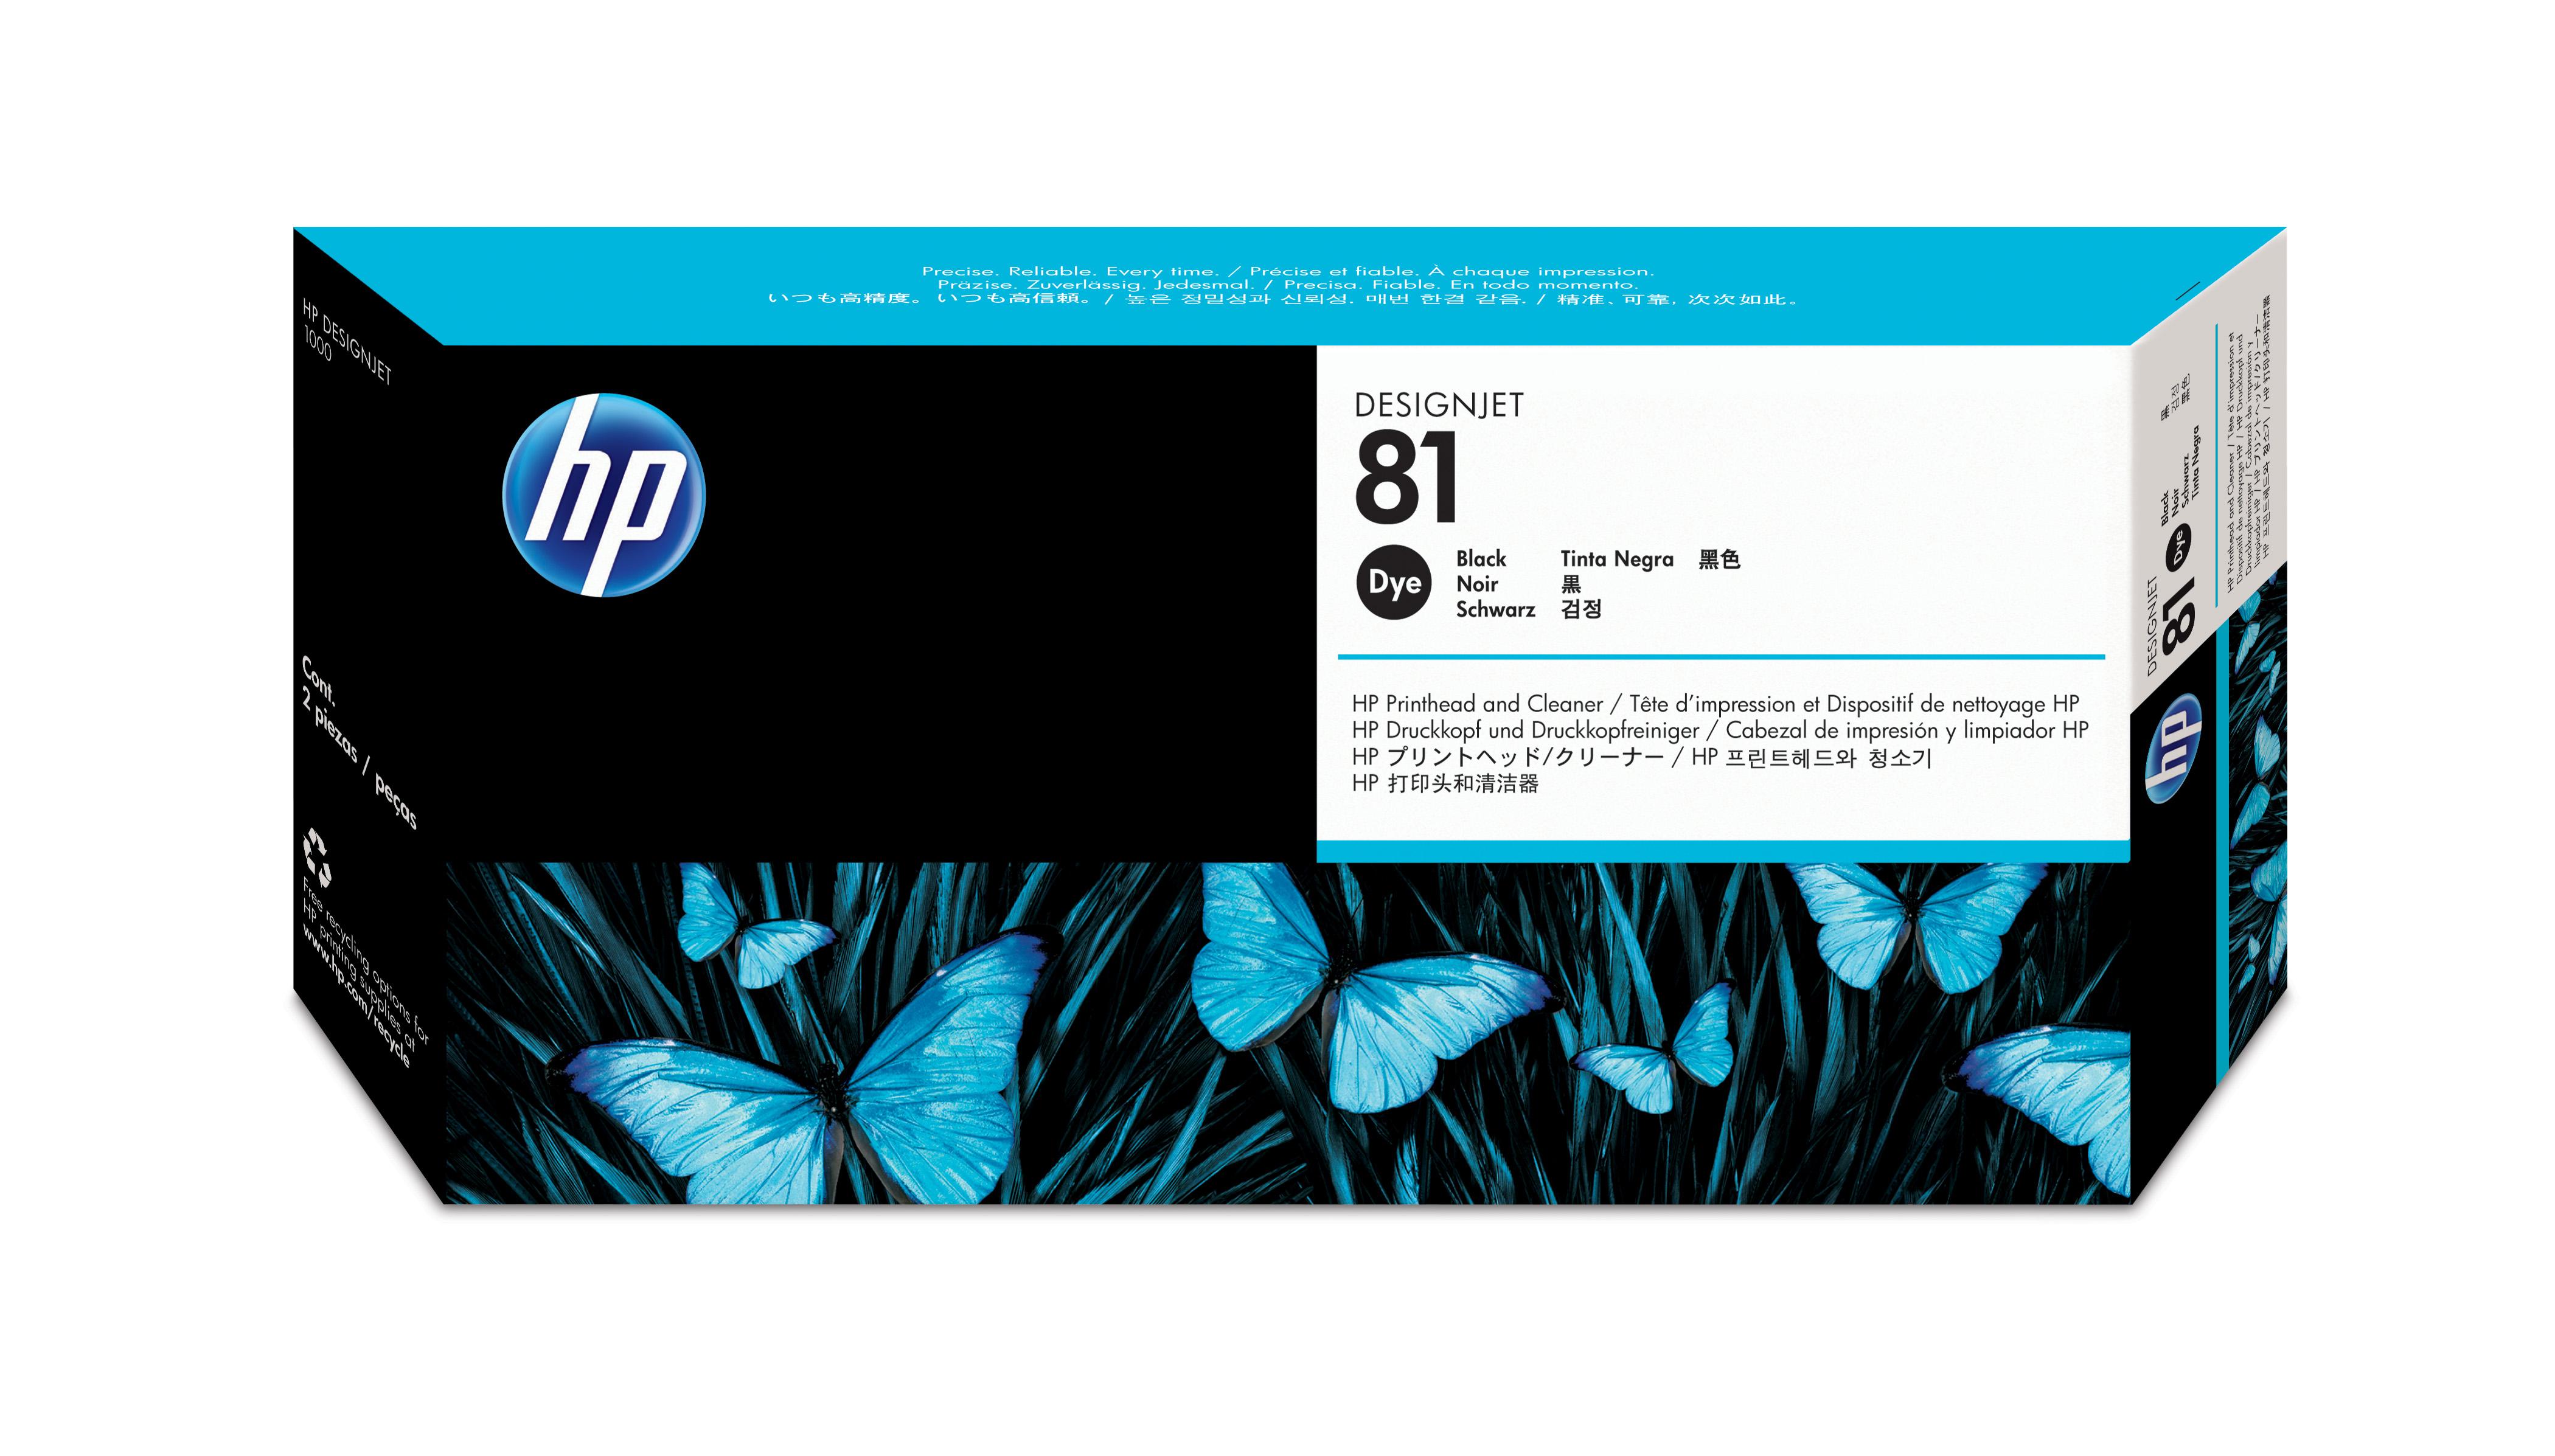 Cartus Inkjet HP 81 dye Black C4950A